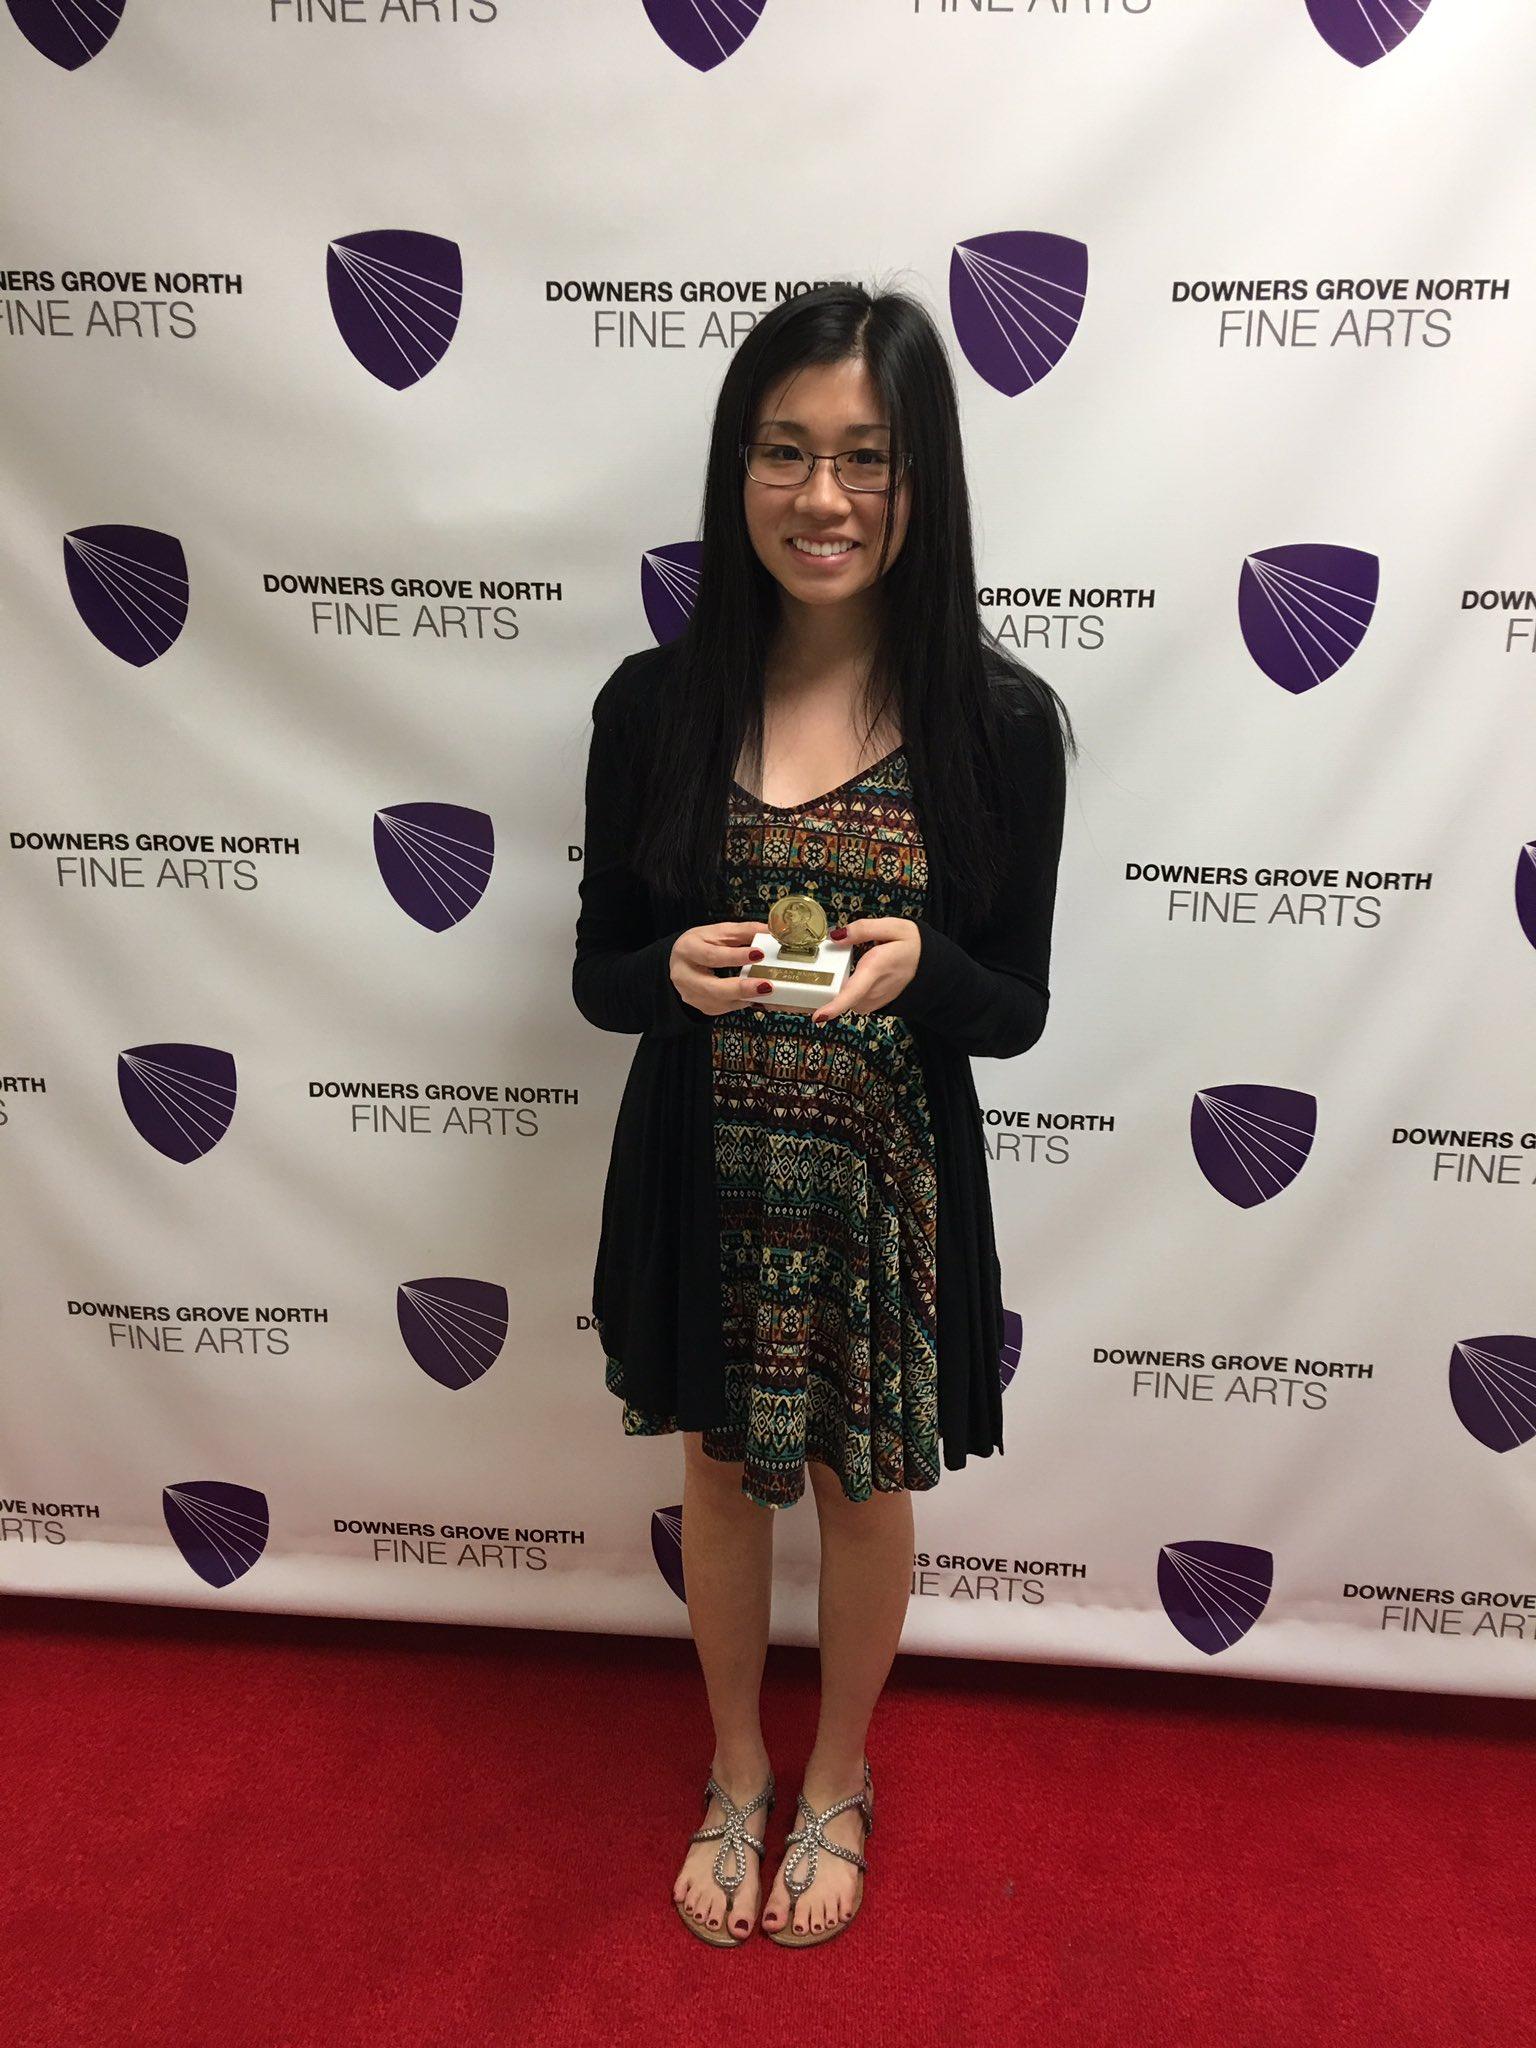 2016 John Phillip Sousa Band Award: Megan Hung #WeAreDGN #99Learns https://t.co/7tTPUI4aZS